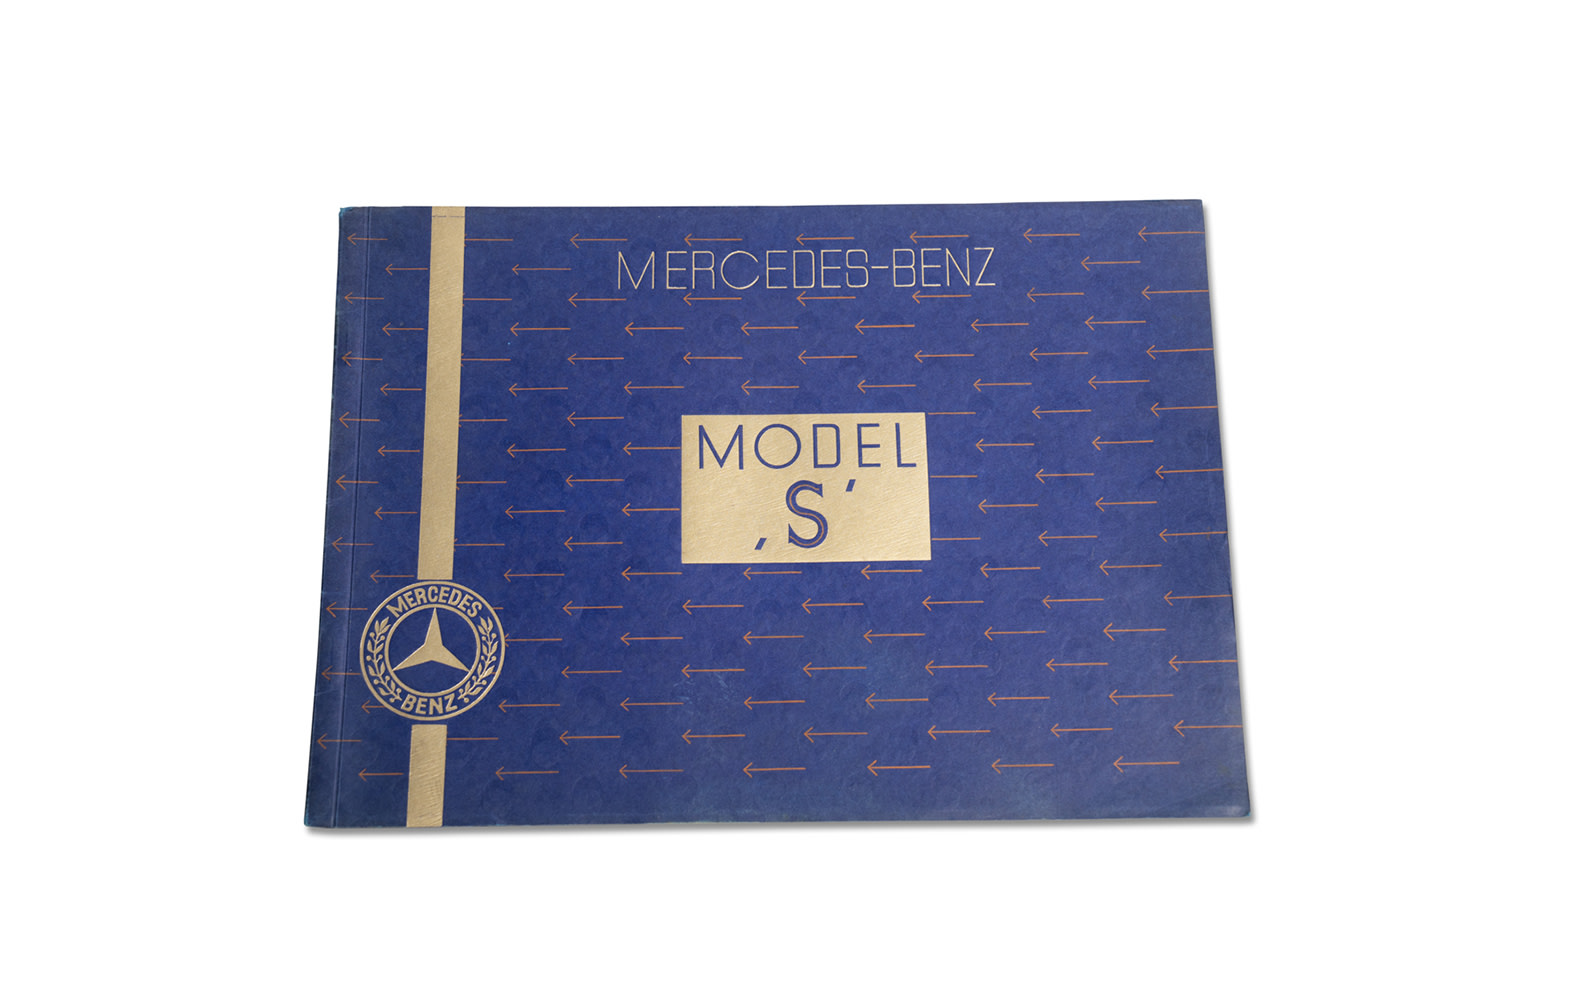 Mercedes-Benz Model S Sales Brochure